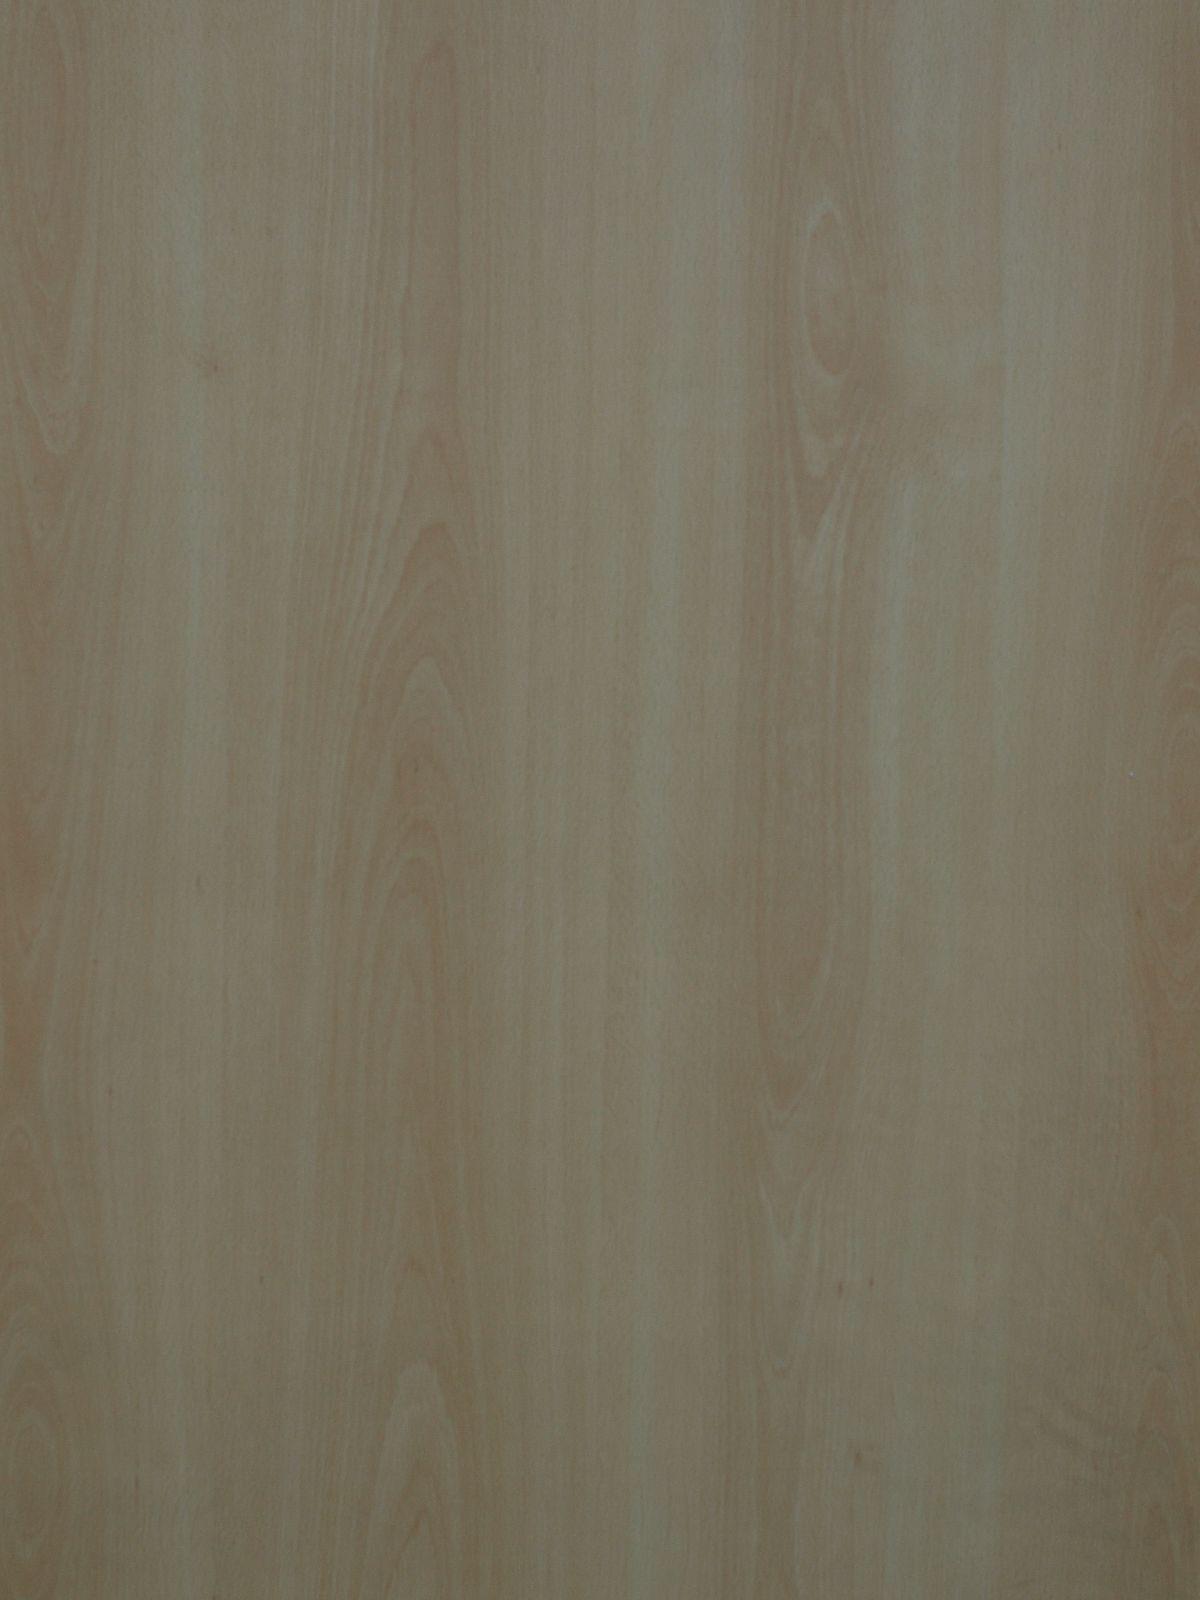 Wood_Texture_A_P1028712